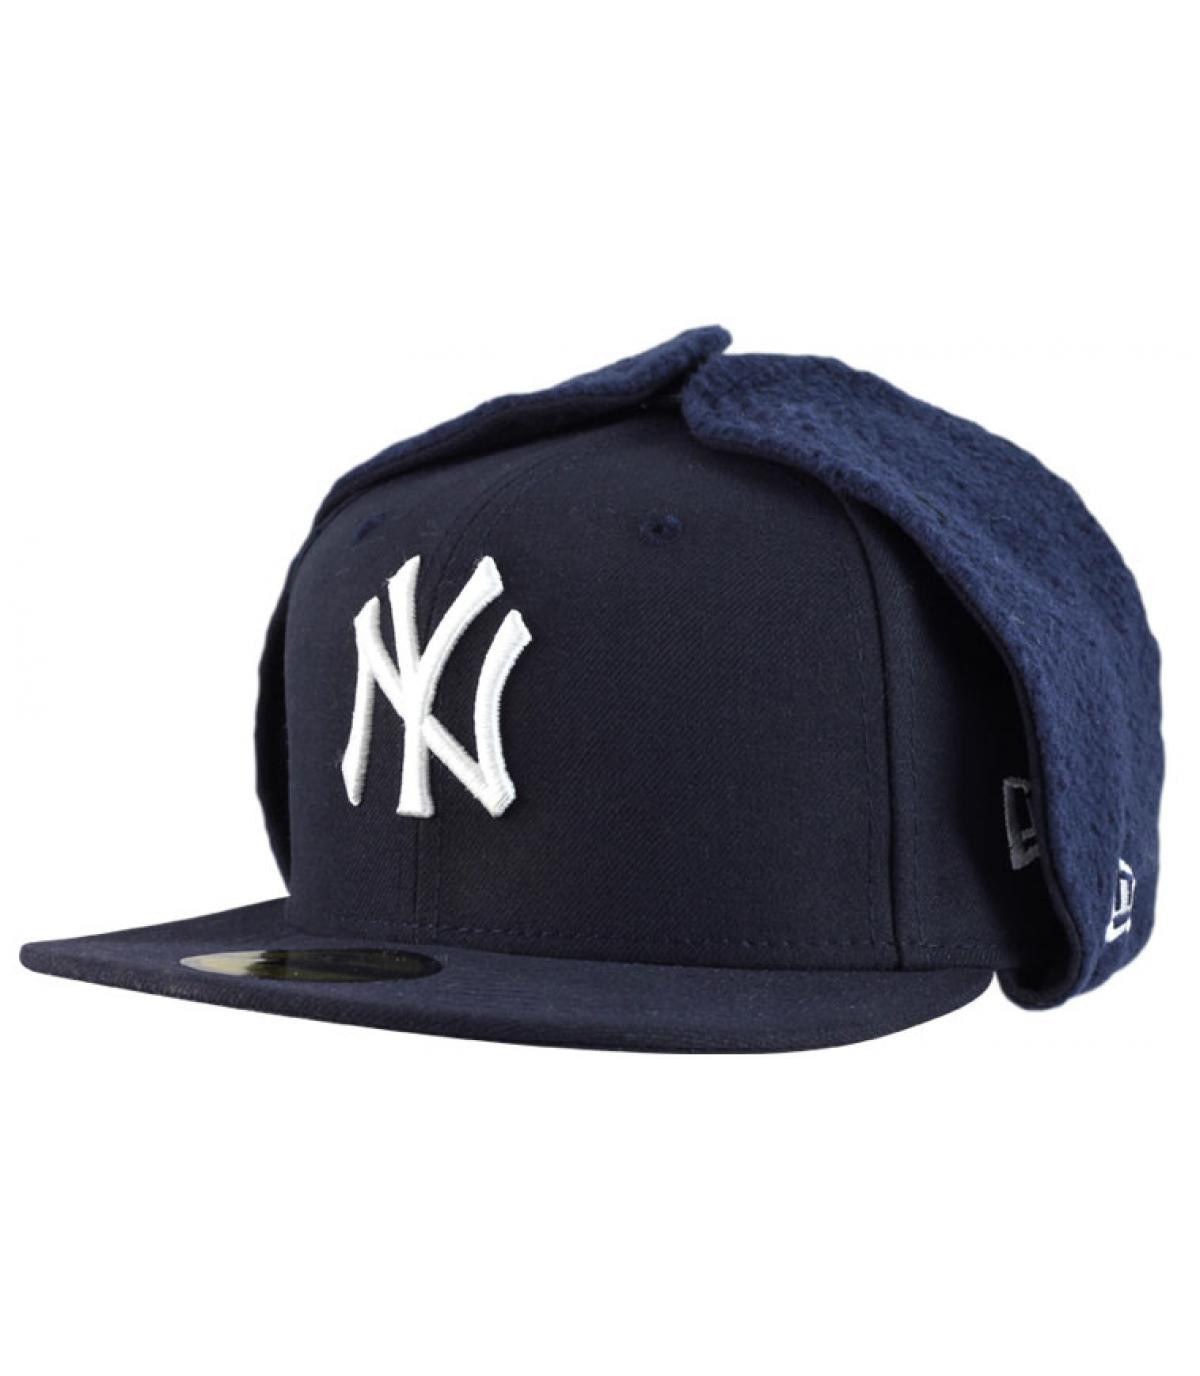 Blue dogear cap